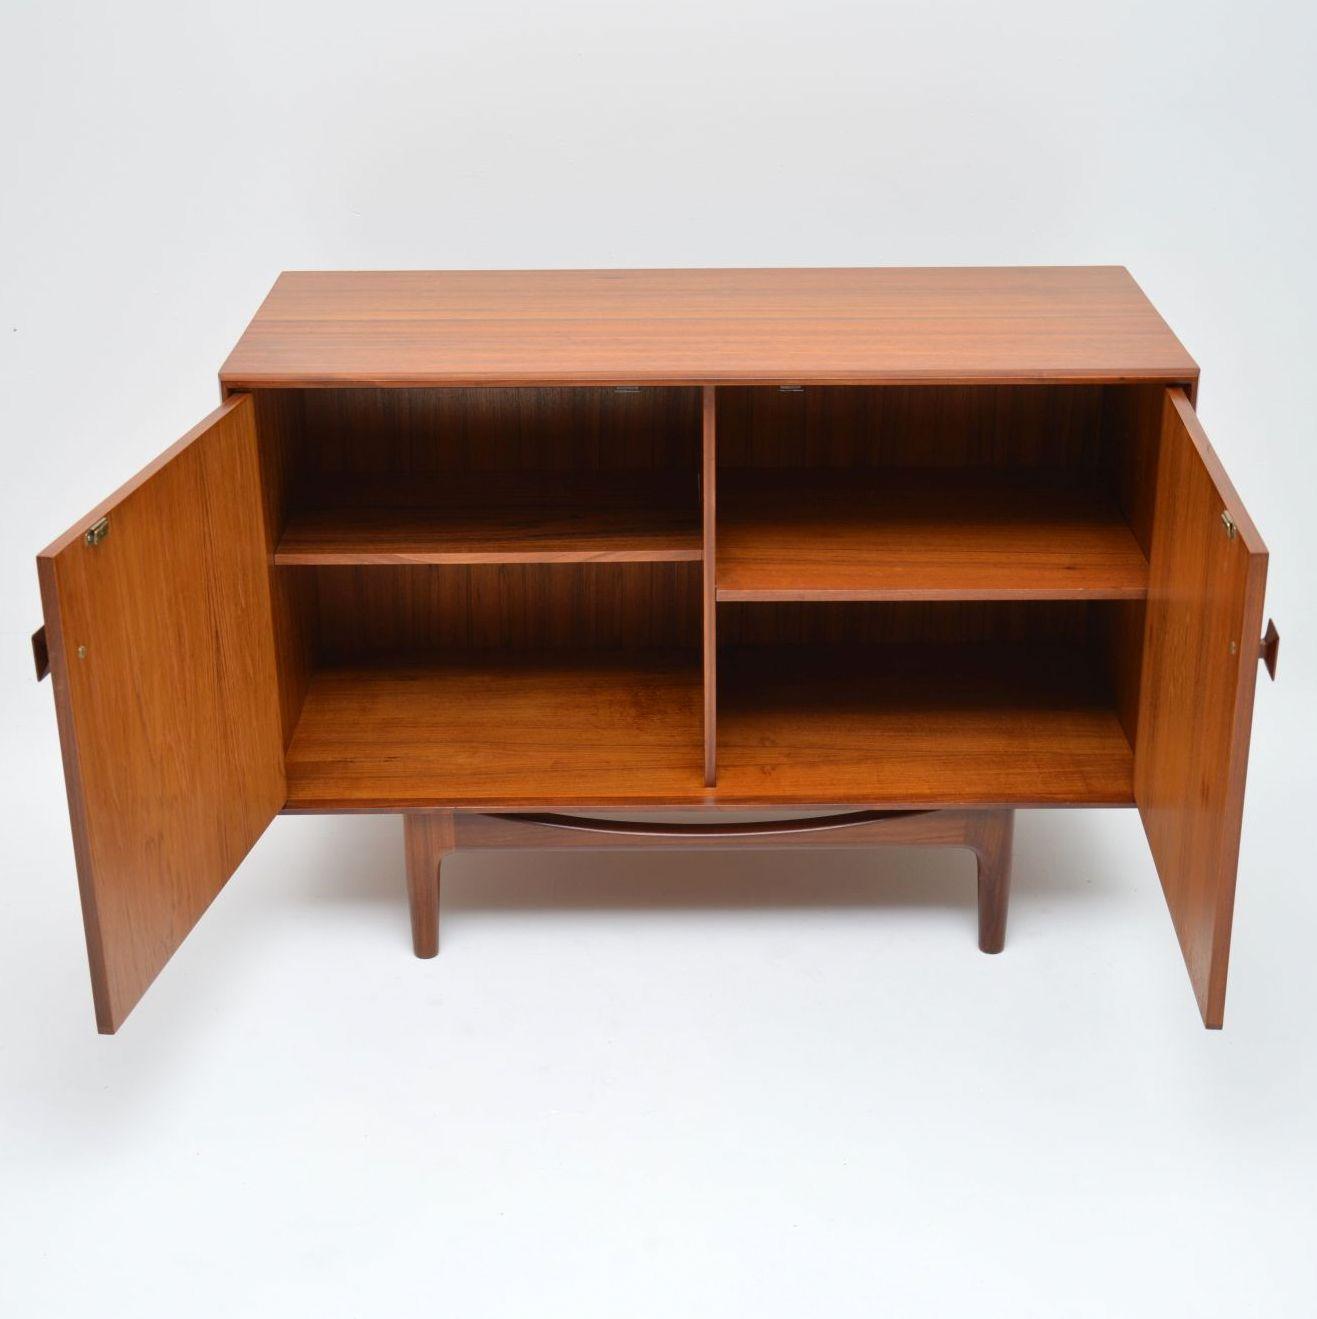 danish_teak_sideboard_cabinet_kofod_larsen_3